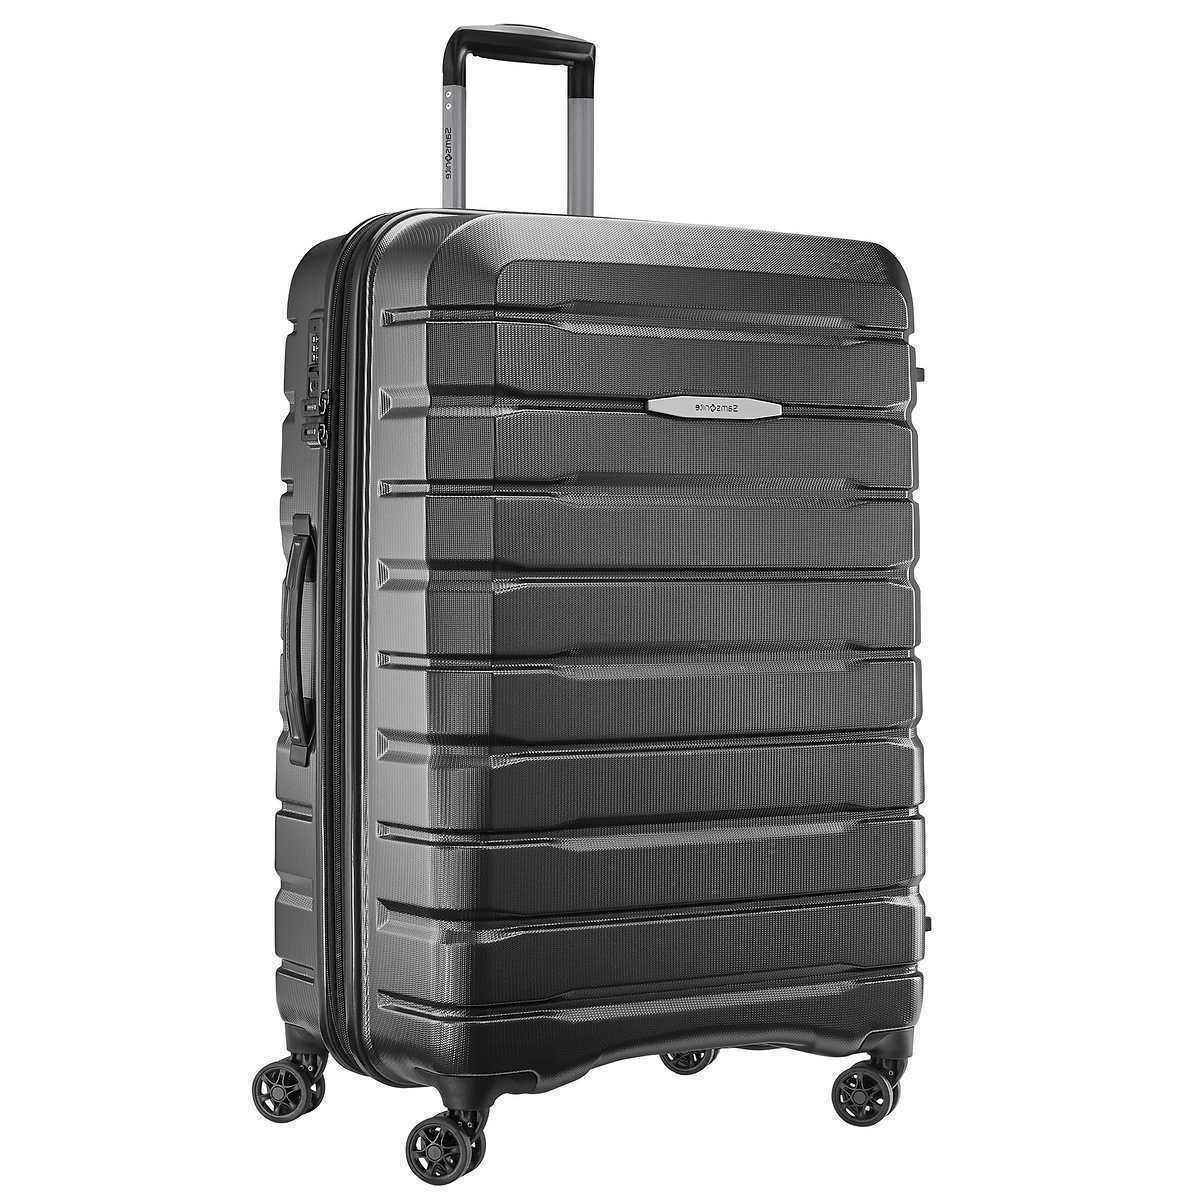 Samsonite Tech 2.0 2 pieces & Travel Luggage Hardside GRAY